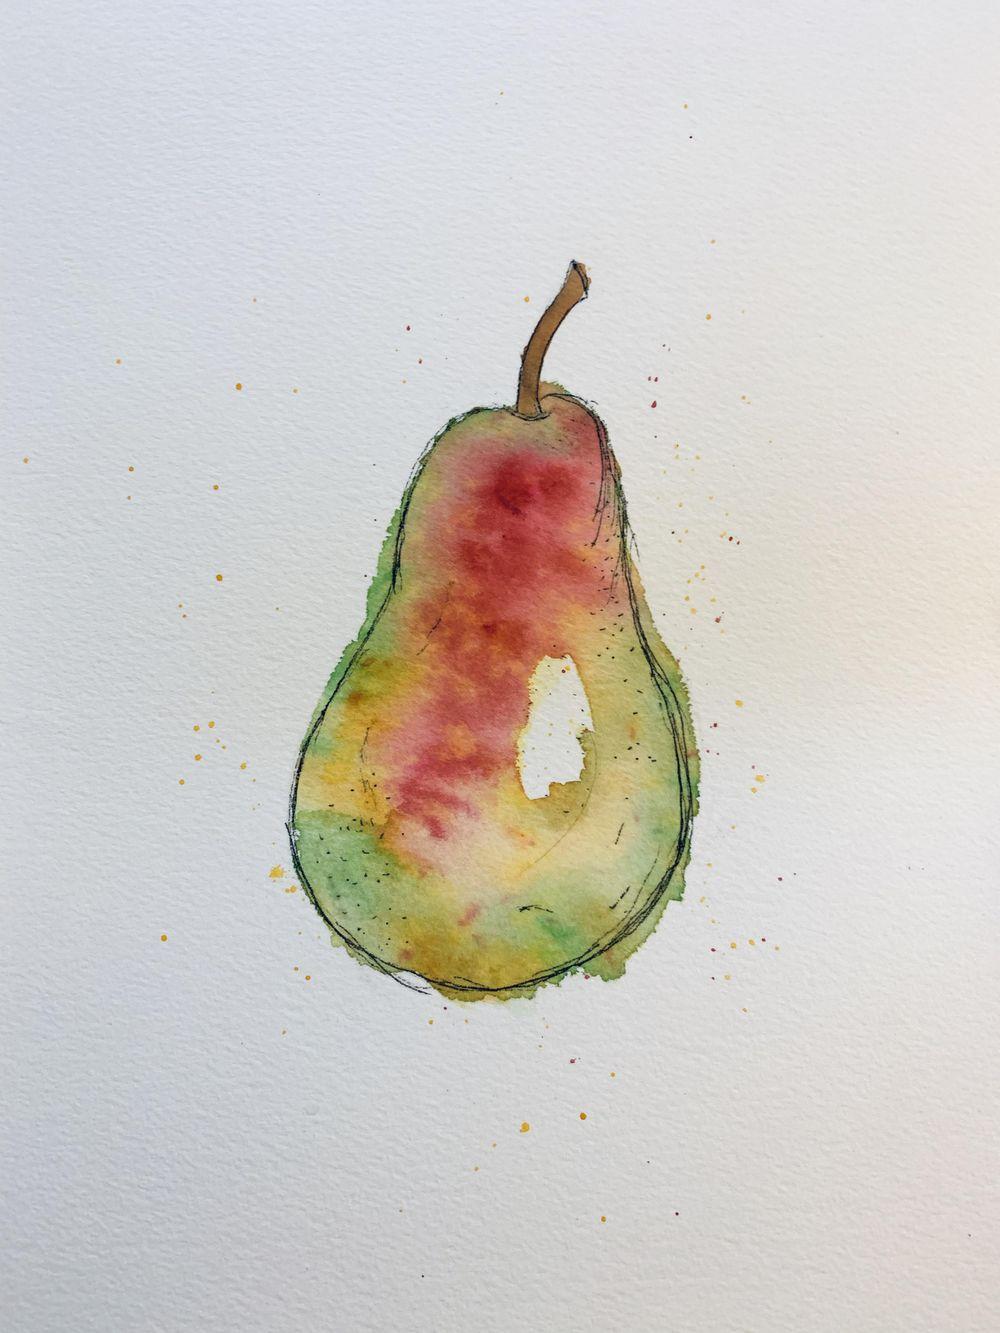 Lemon & More - image 3 - student project